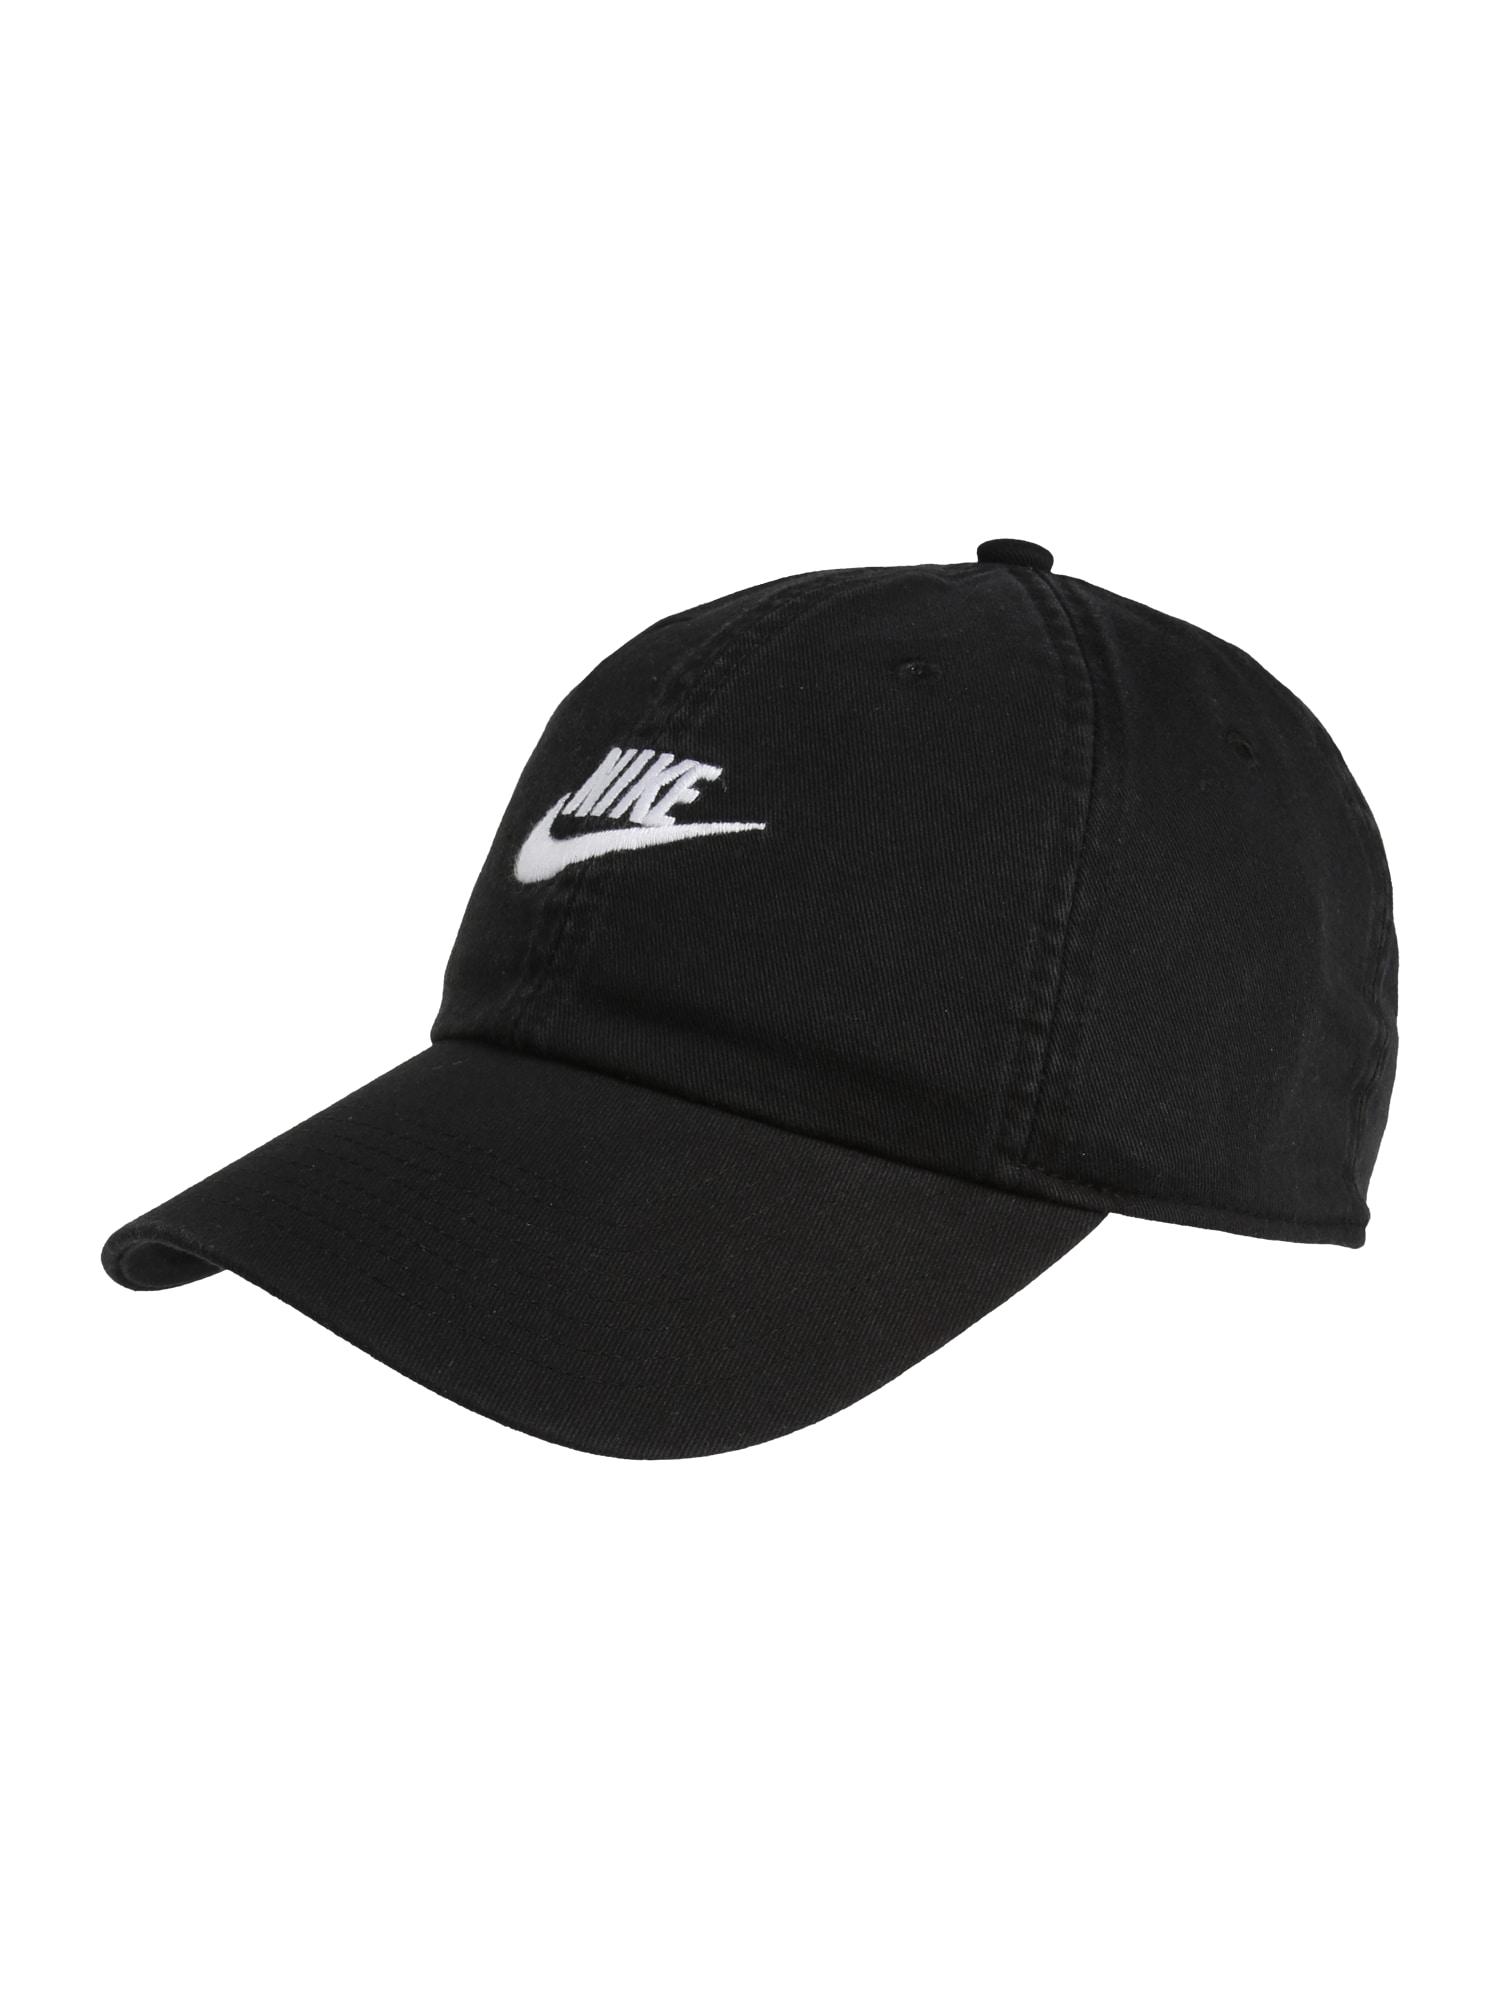 Nike Sportswear Kepurė juoda